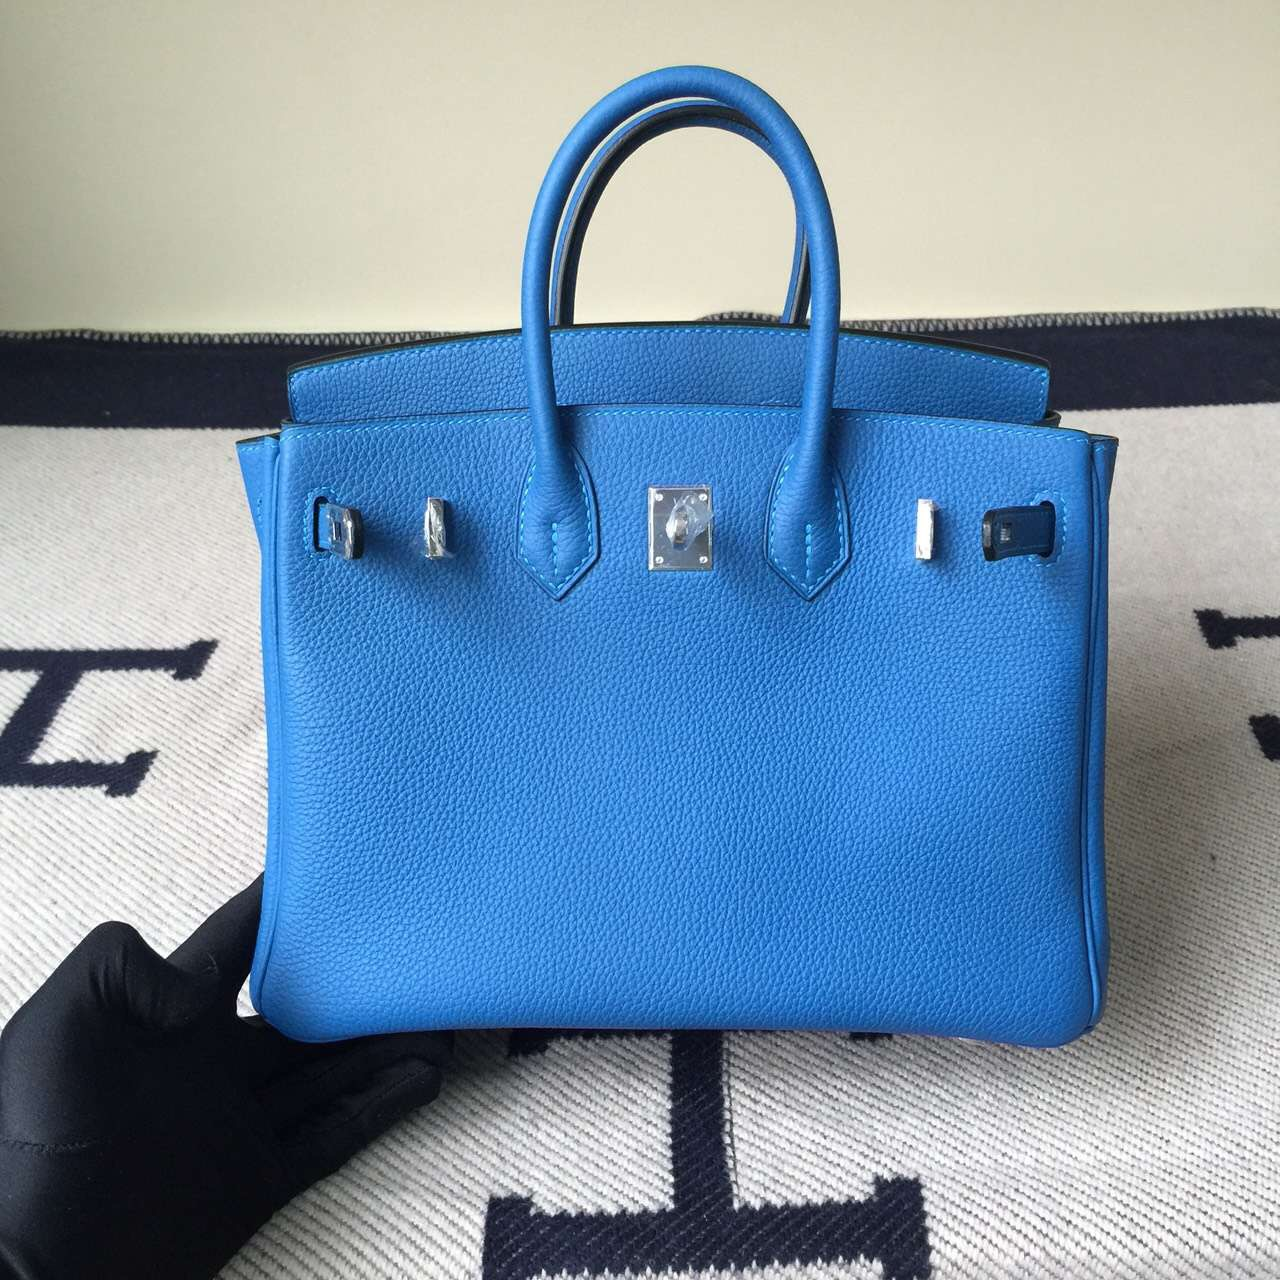 Hand Stitching Hermes Birkin25cm 7Q Mykono Blue Togo Leather Handbag